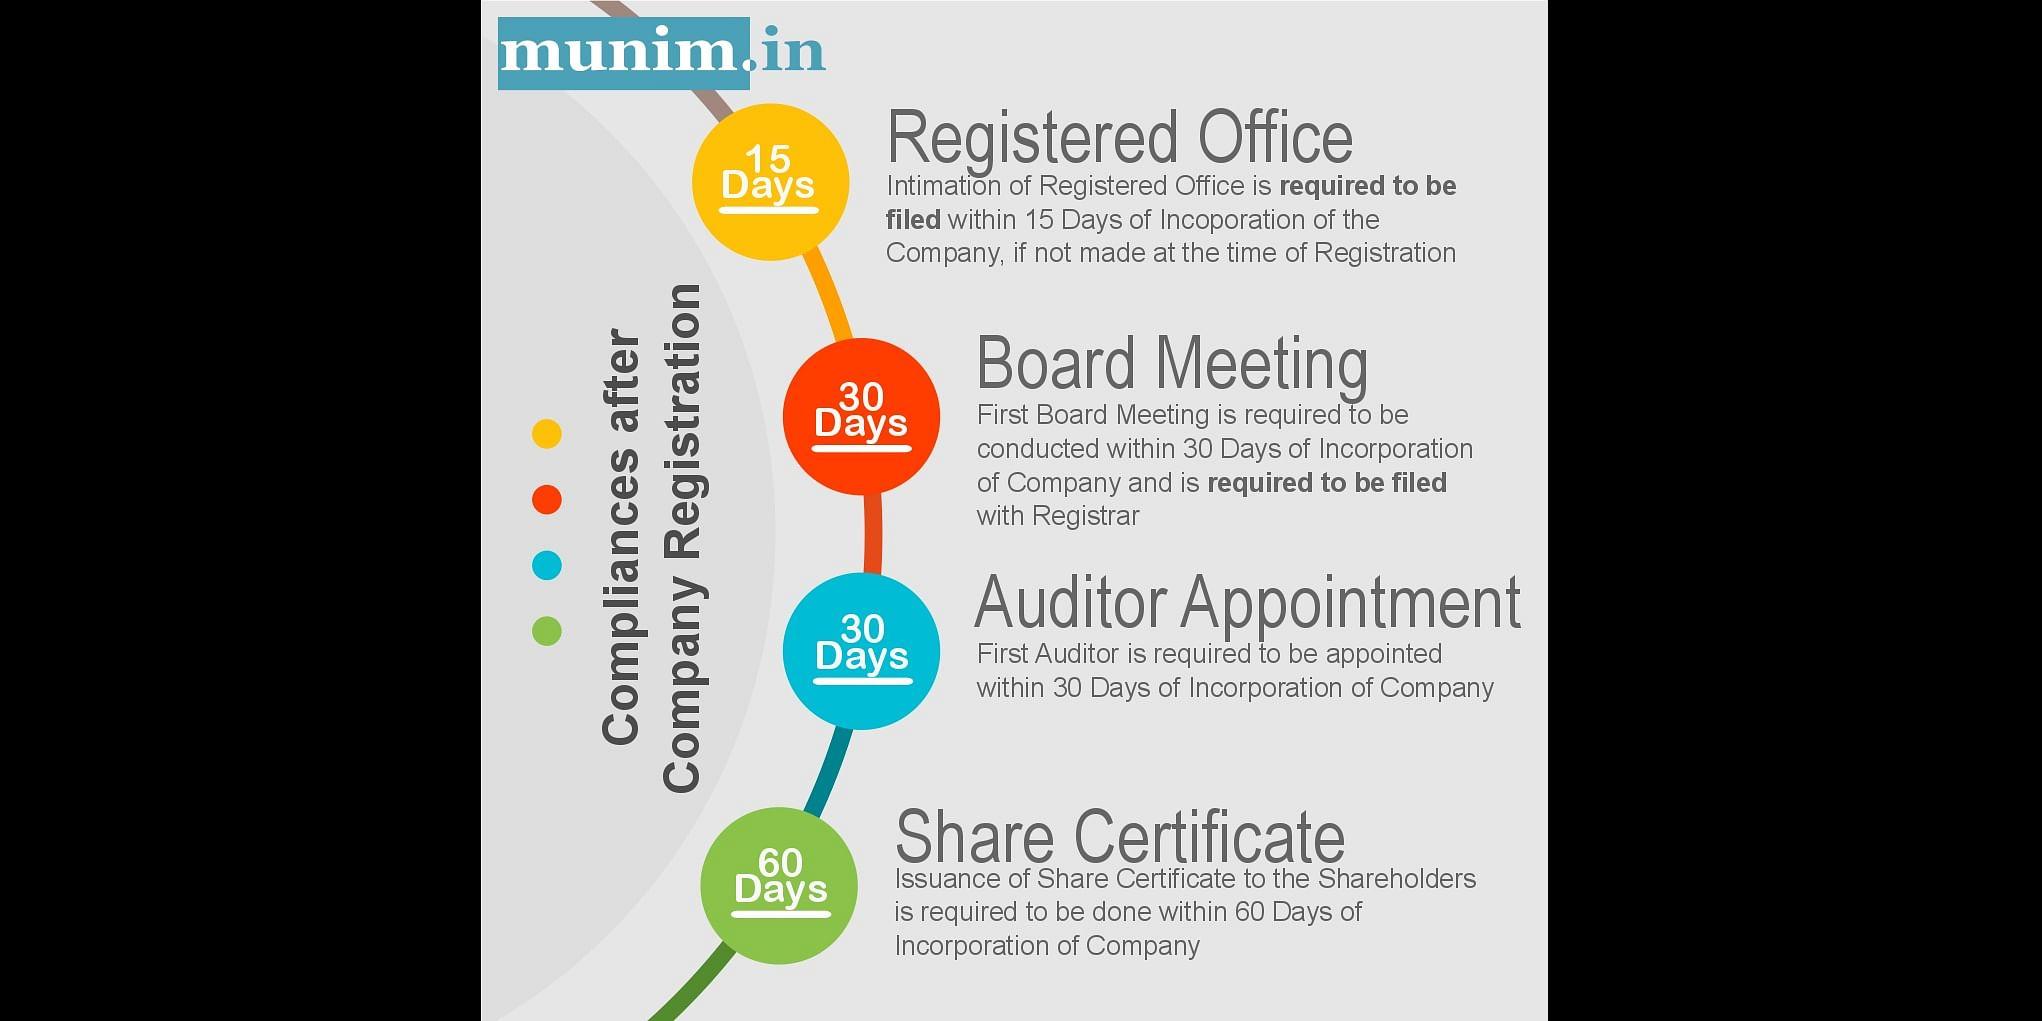 Post Company Registration Compliance